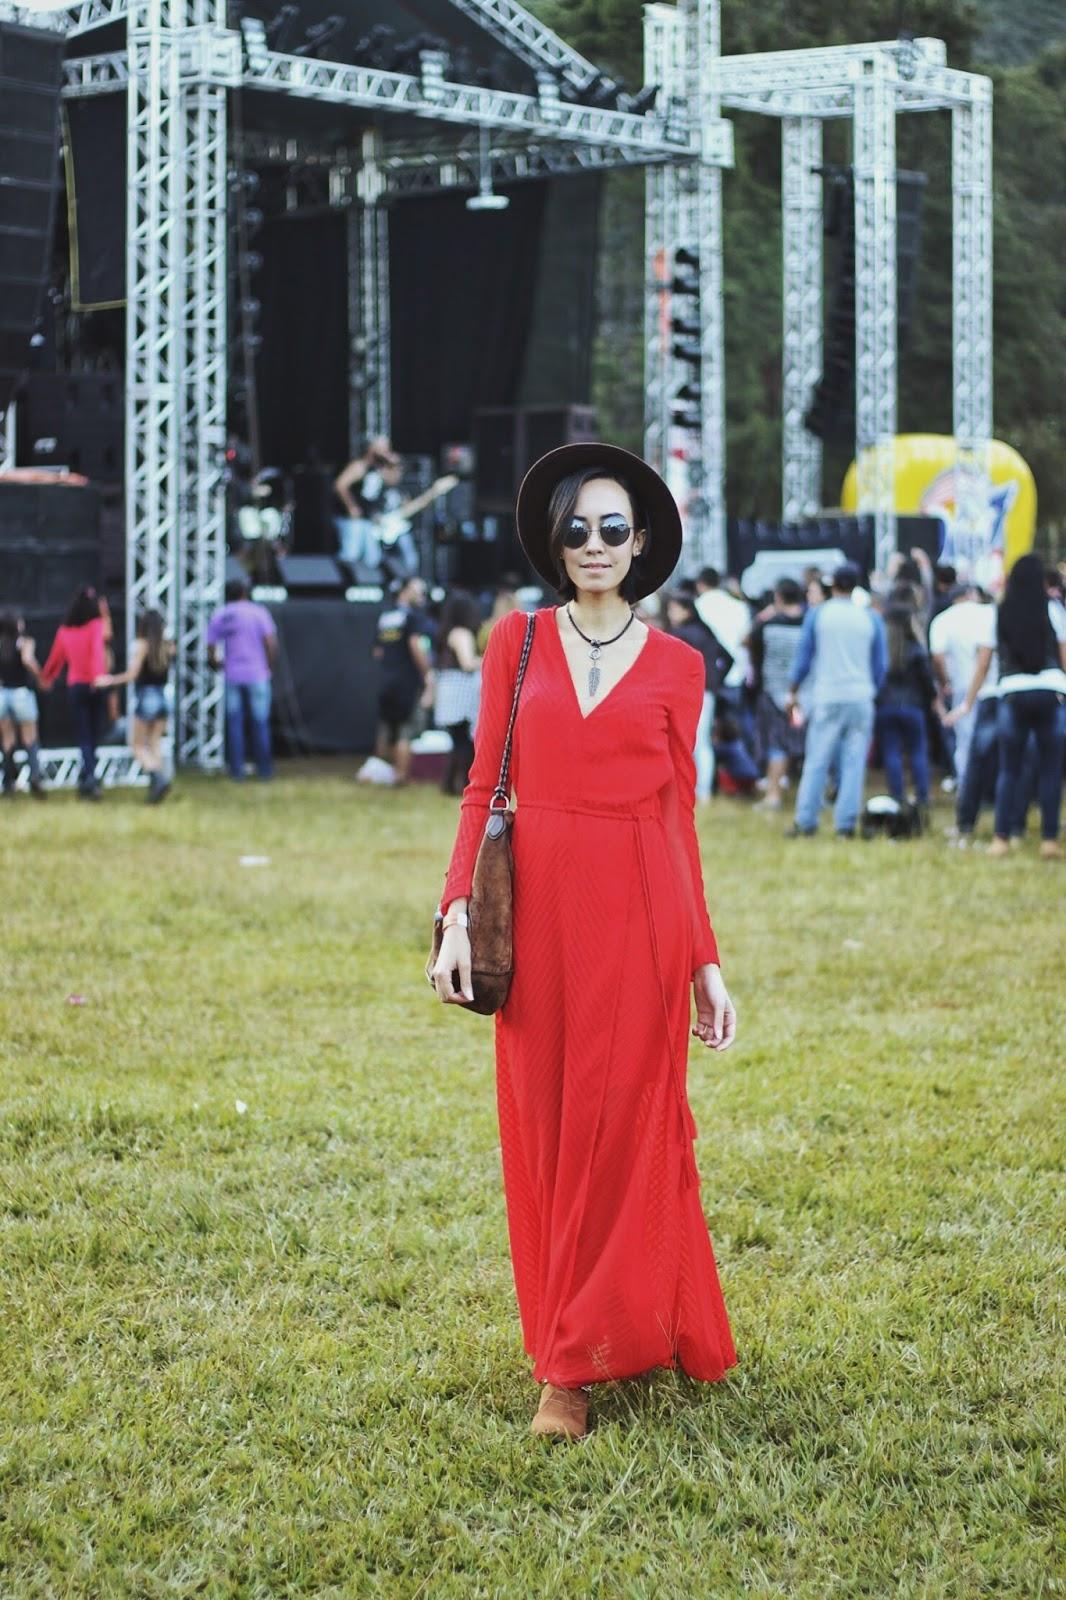 lifesthayle-look-congonhas-motofest-vestido-vermelho.JPG